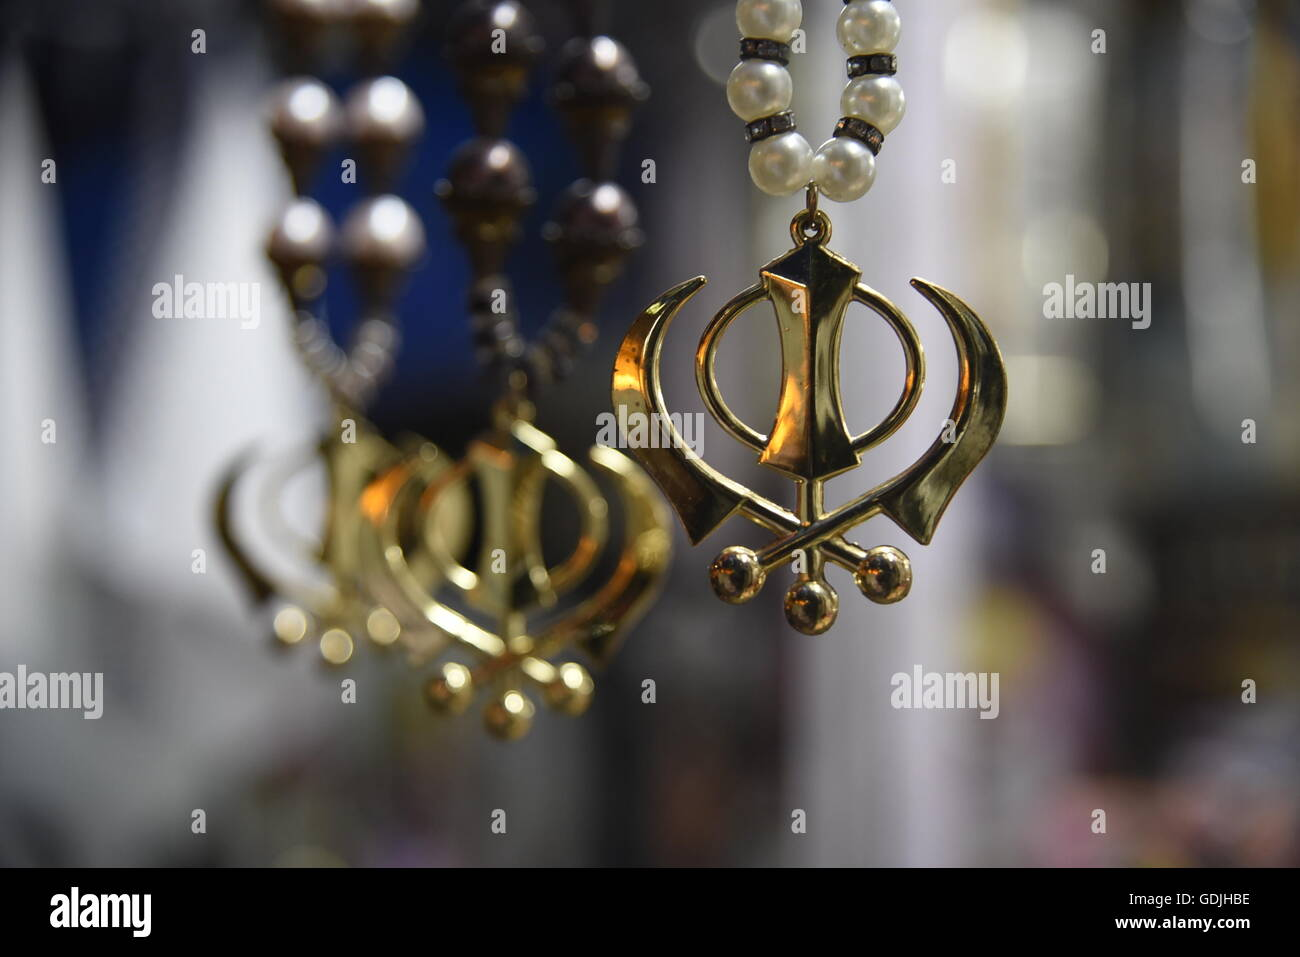 Sikhism Emblem Khanda Religious Symbol The Insignia Of The Khalsa